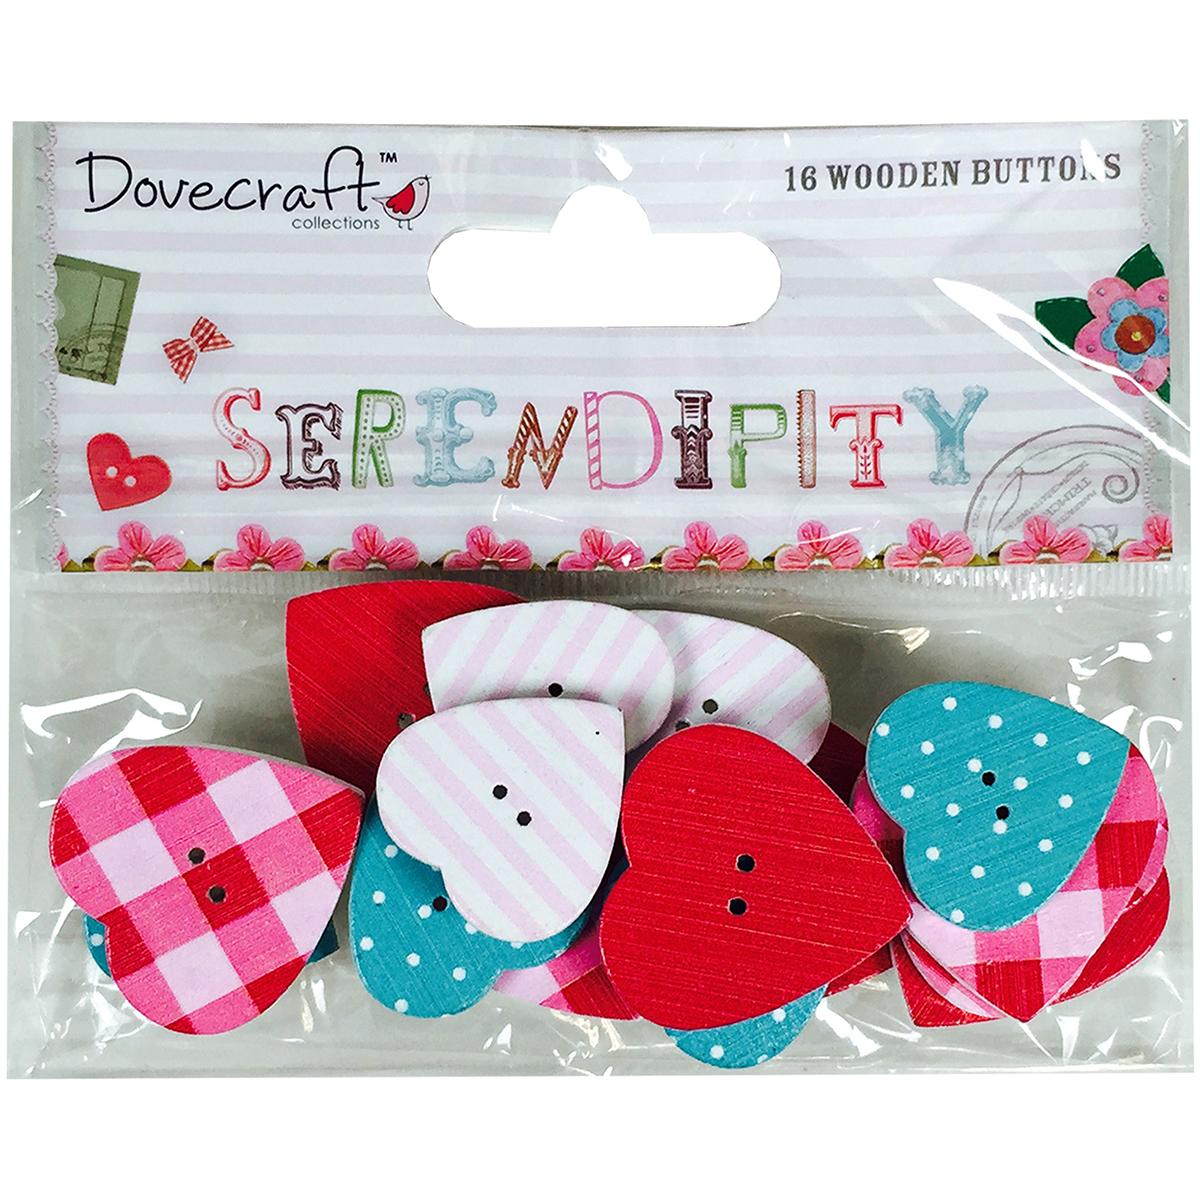 Dovecraft Serendipity Wooden Buttons 16/Pkg-Printed Heart